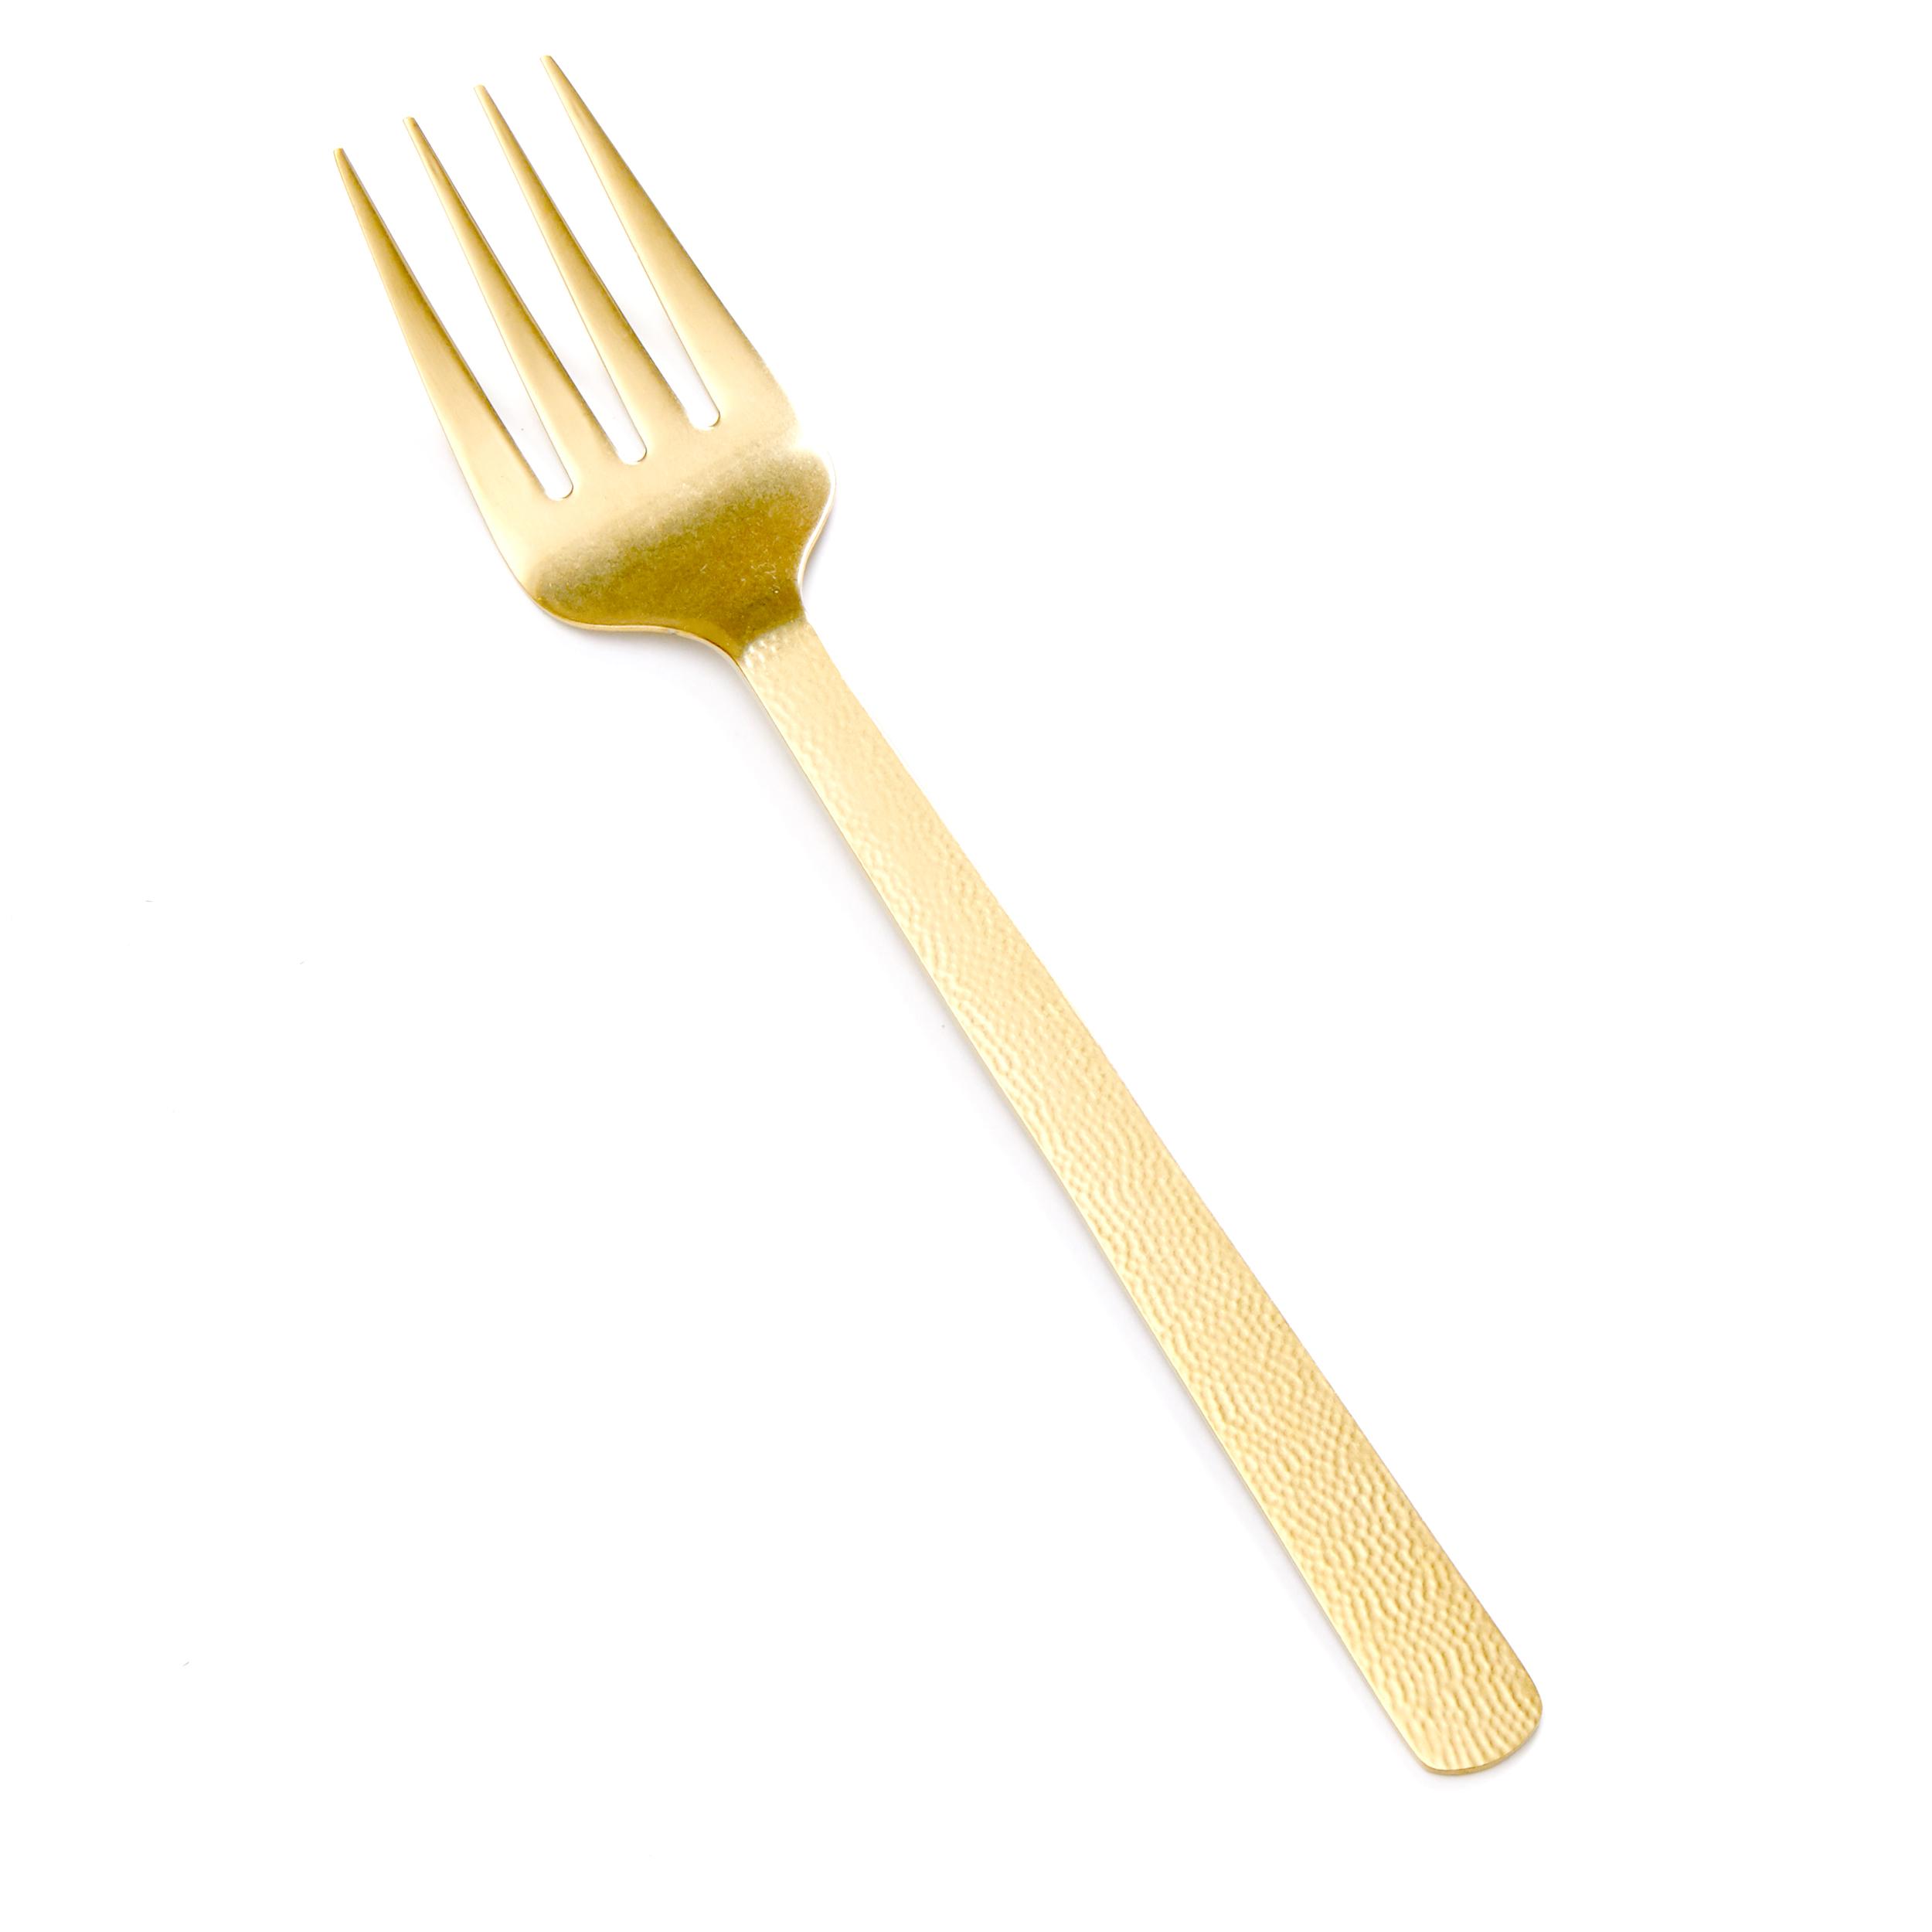 American Metalcraft GVHF serving fork